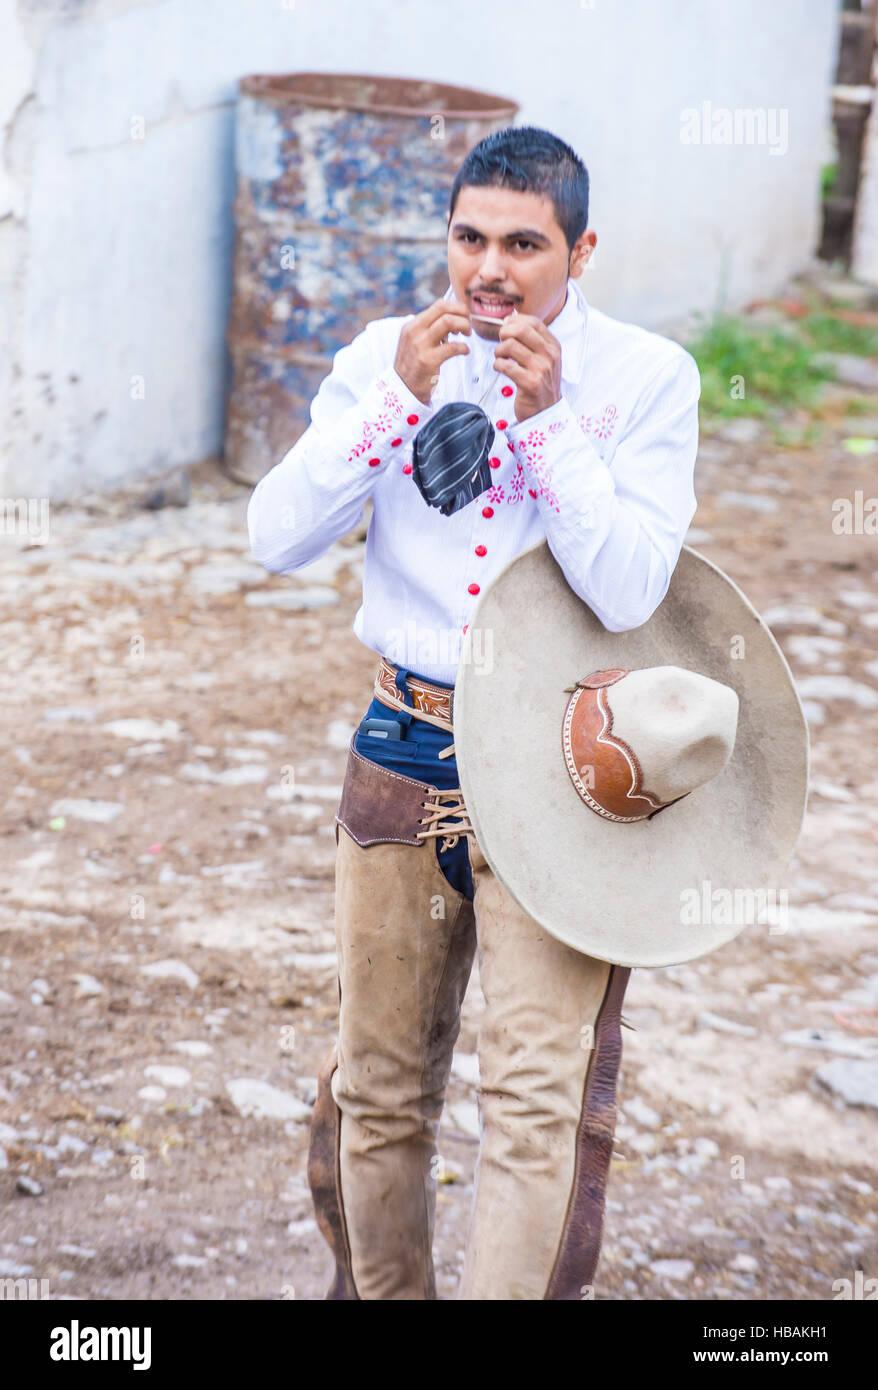 El Charro participa en el 23º Festival Internacional de Mariachi y Charros  en Guadalajara Imagen De b4dfa1a48ca